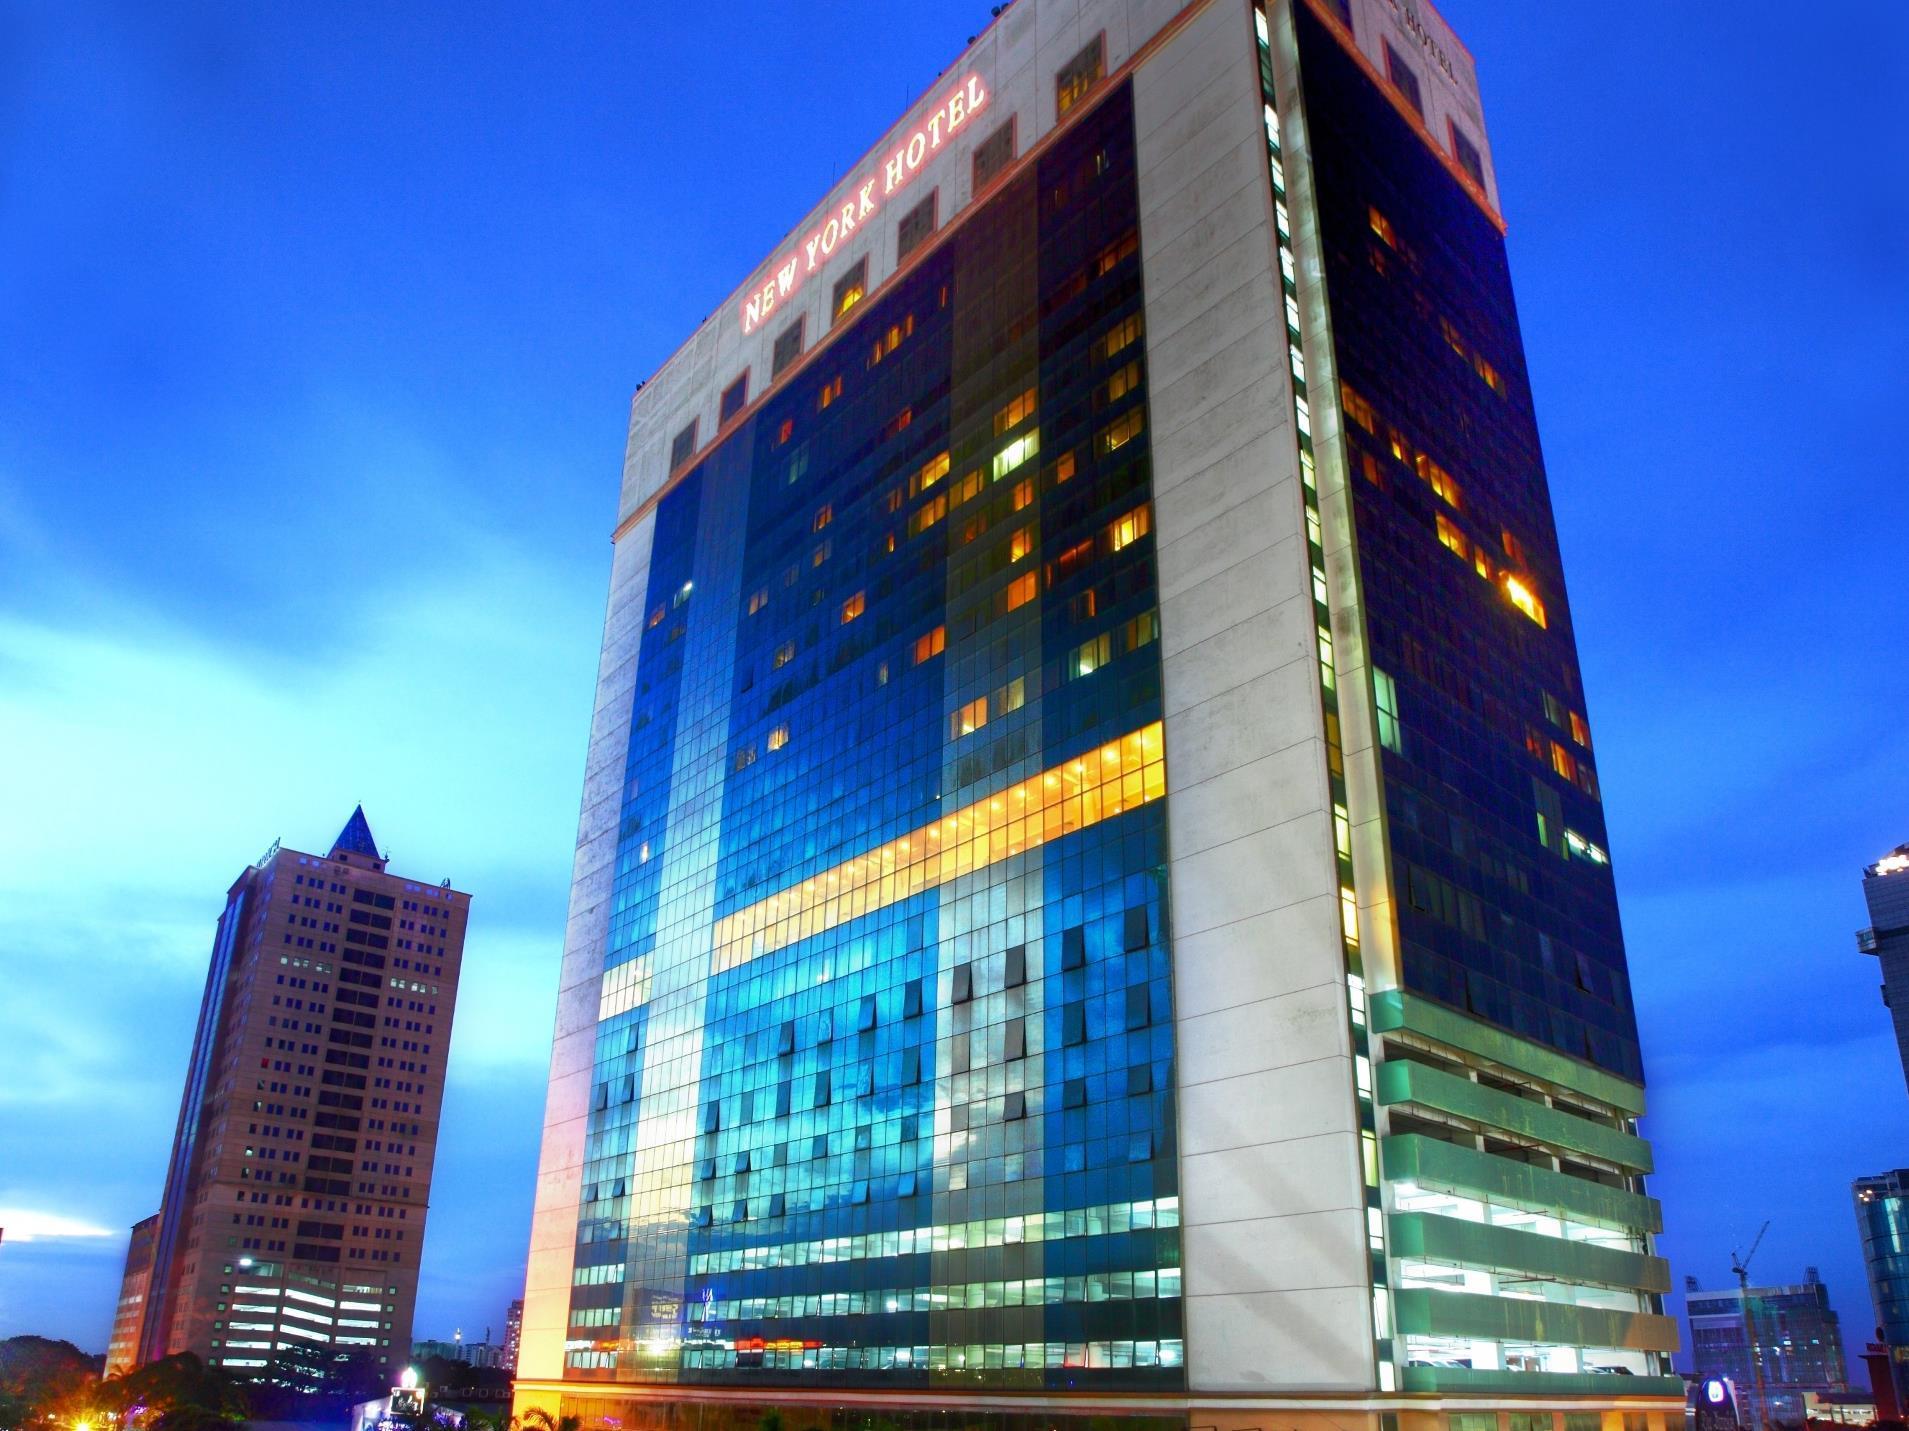 New York Hotel Johor Bahru Promo Terbaru 2020 Rp 331467 Foto Hd Ulasan